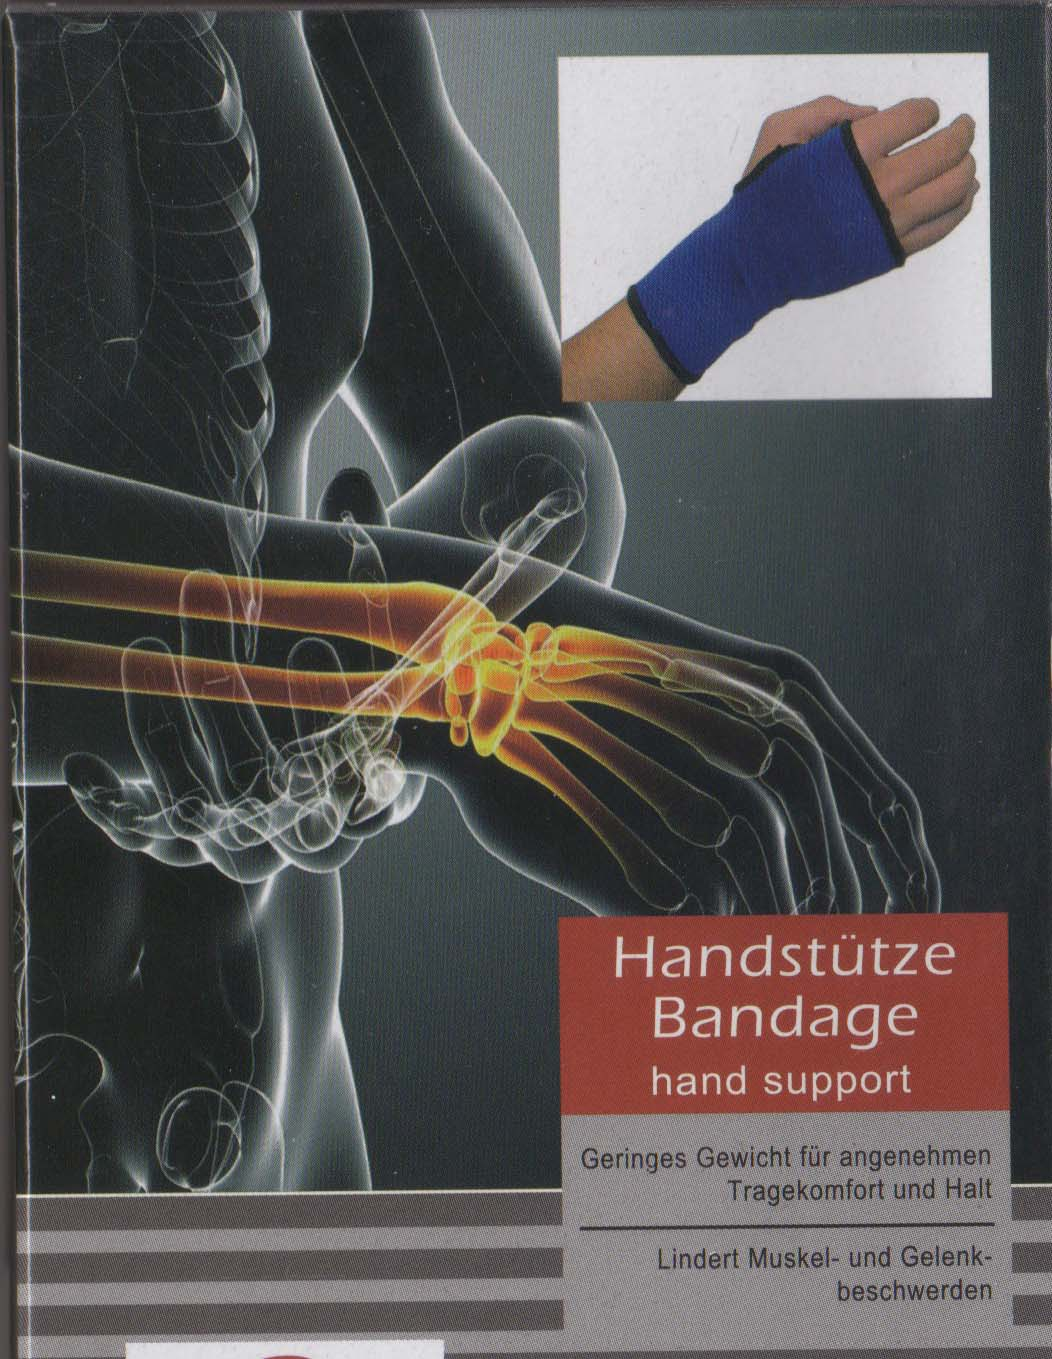 PROFI Handstütze Bandage Hand stützen Handgelenk Muskel lindert Gelenk Schmerzen